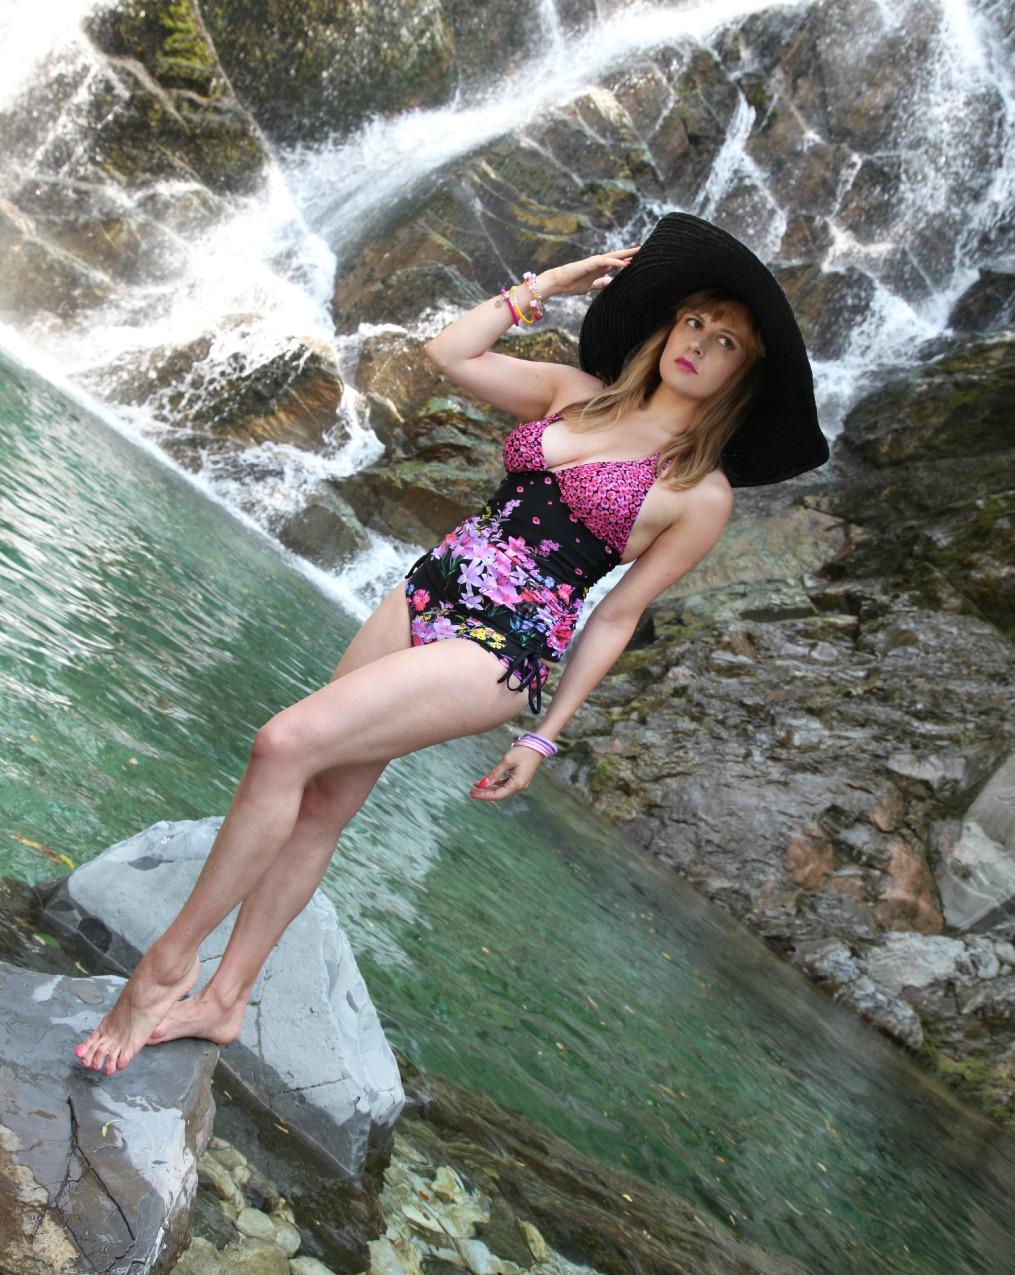 Un tuffo nel blu - flowers edition, alessia milanese, thechilicool, fashion blog, fashion blogger, bikiniworld